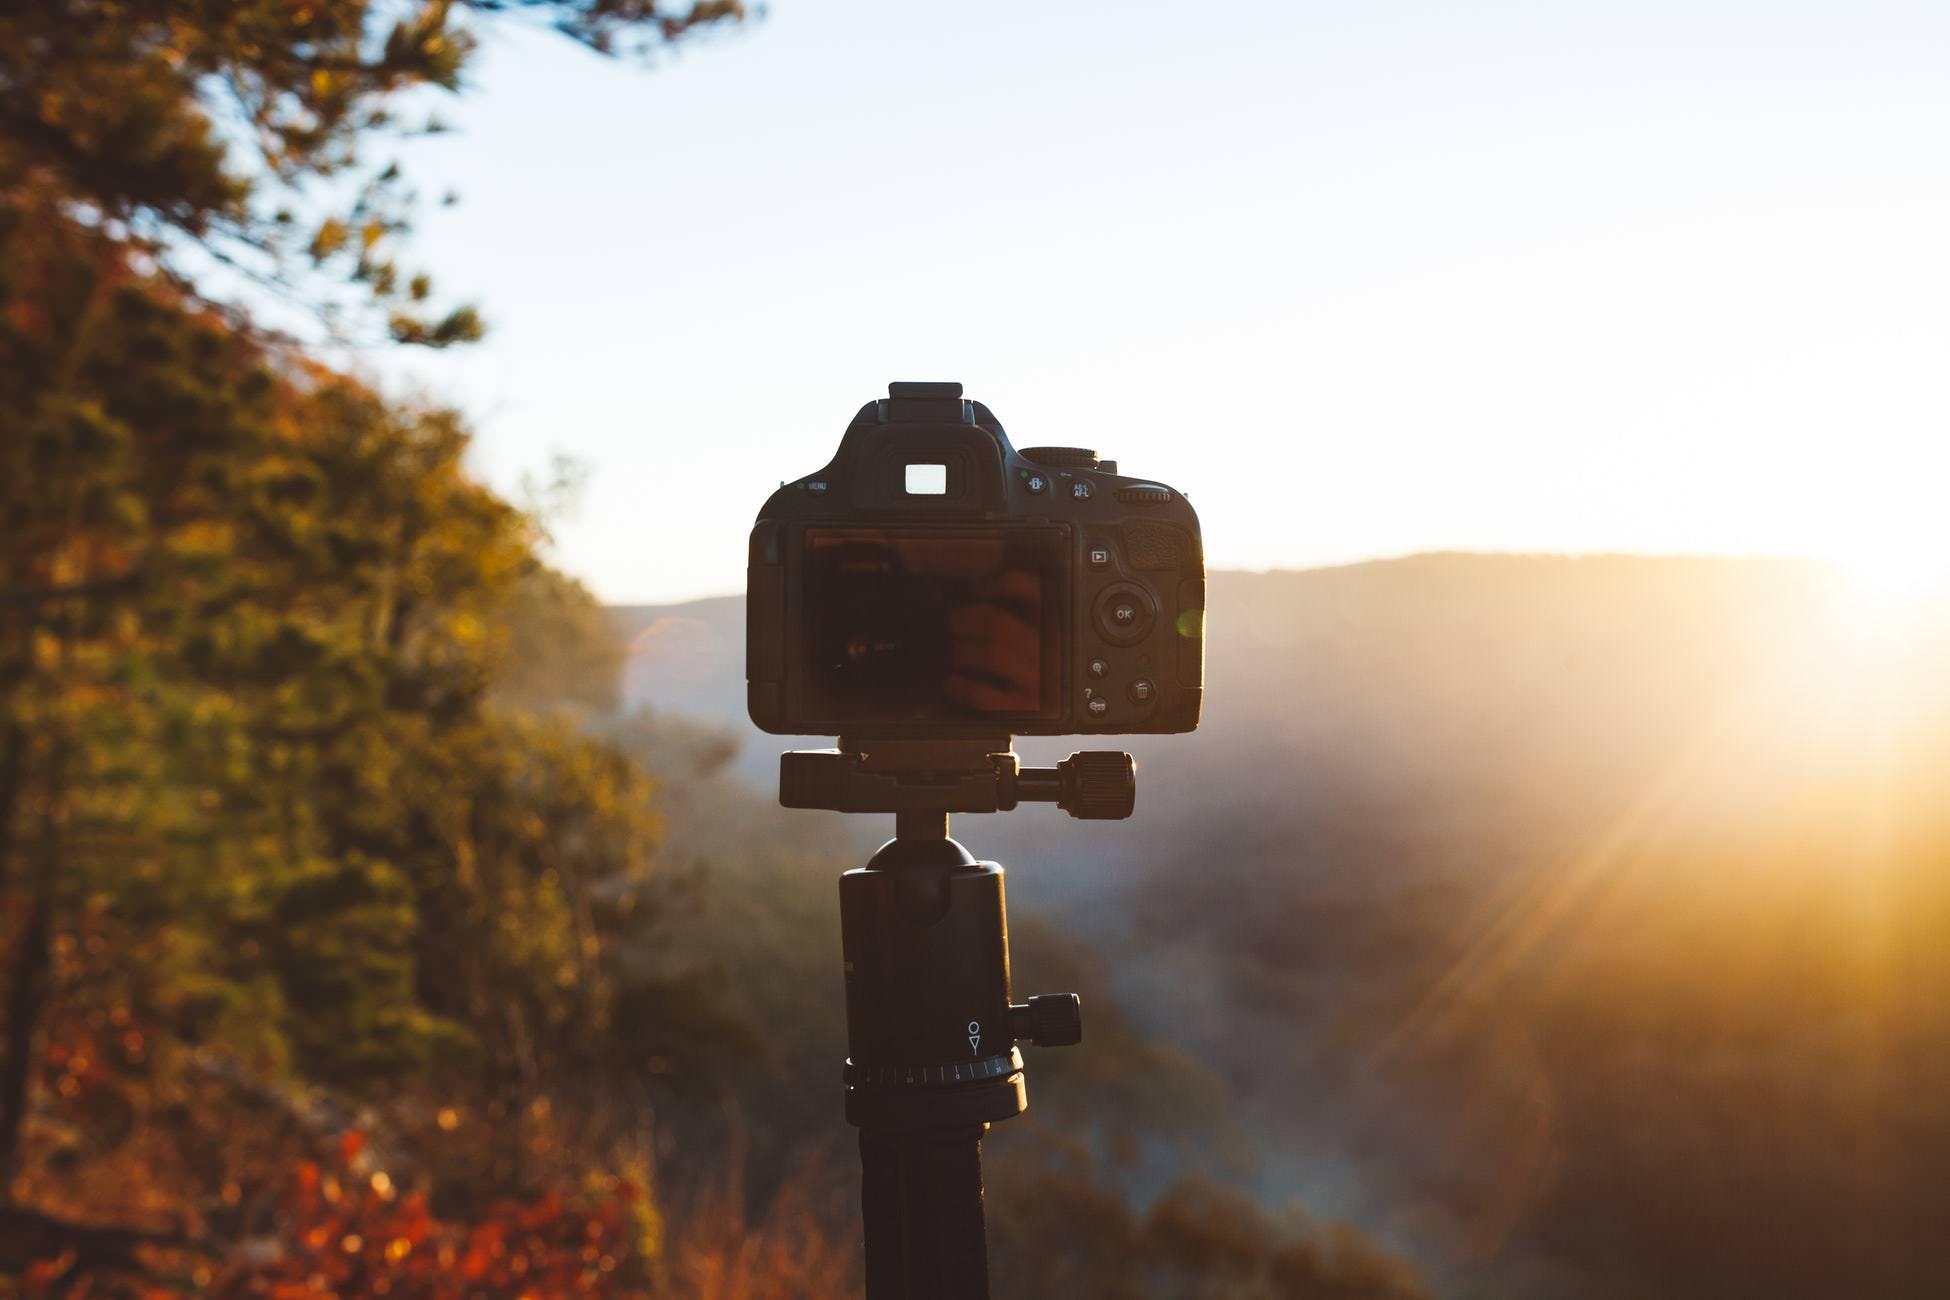 trípode, duke fotografia, duke el blog, blog duke fotografia,